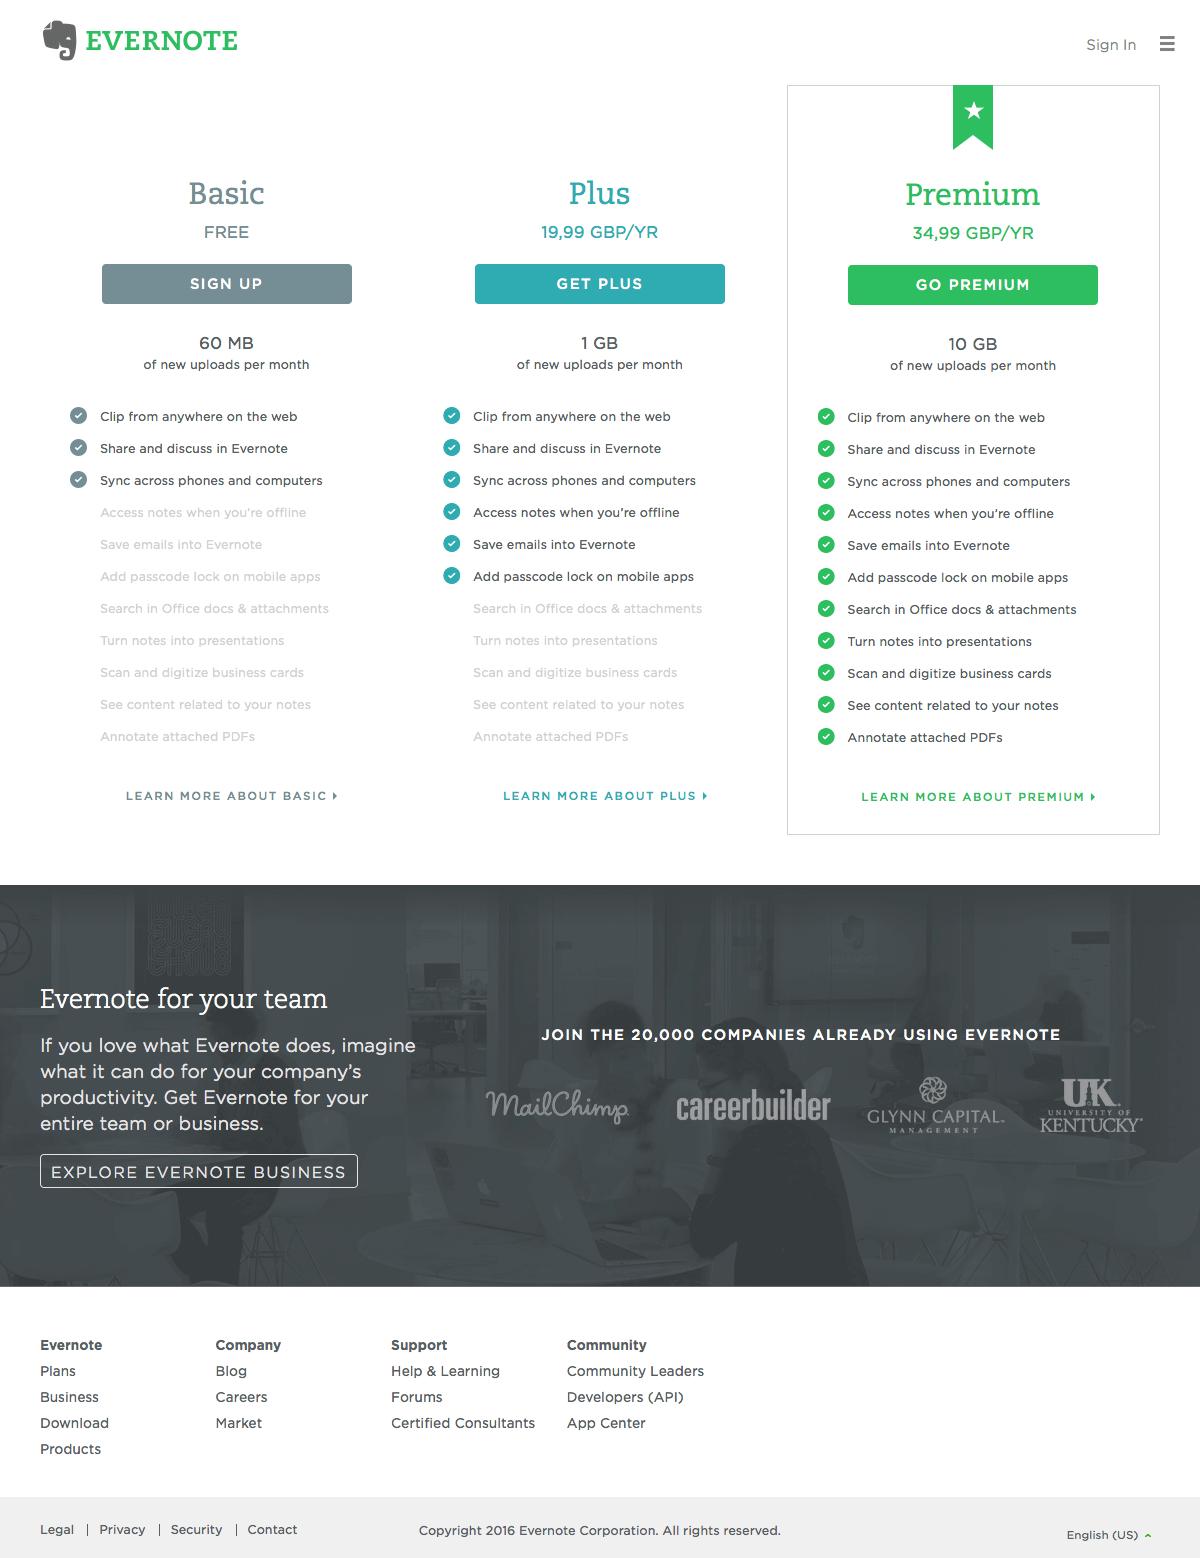 Pricing saas page inspiration - Evernote